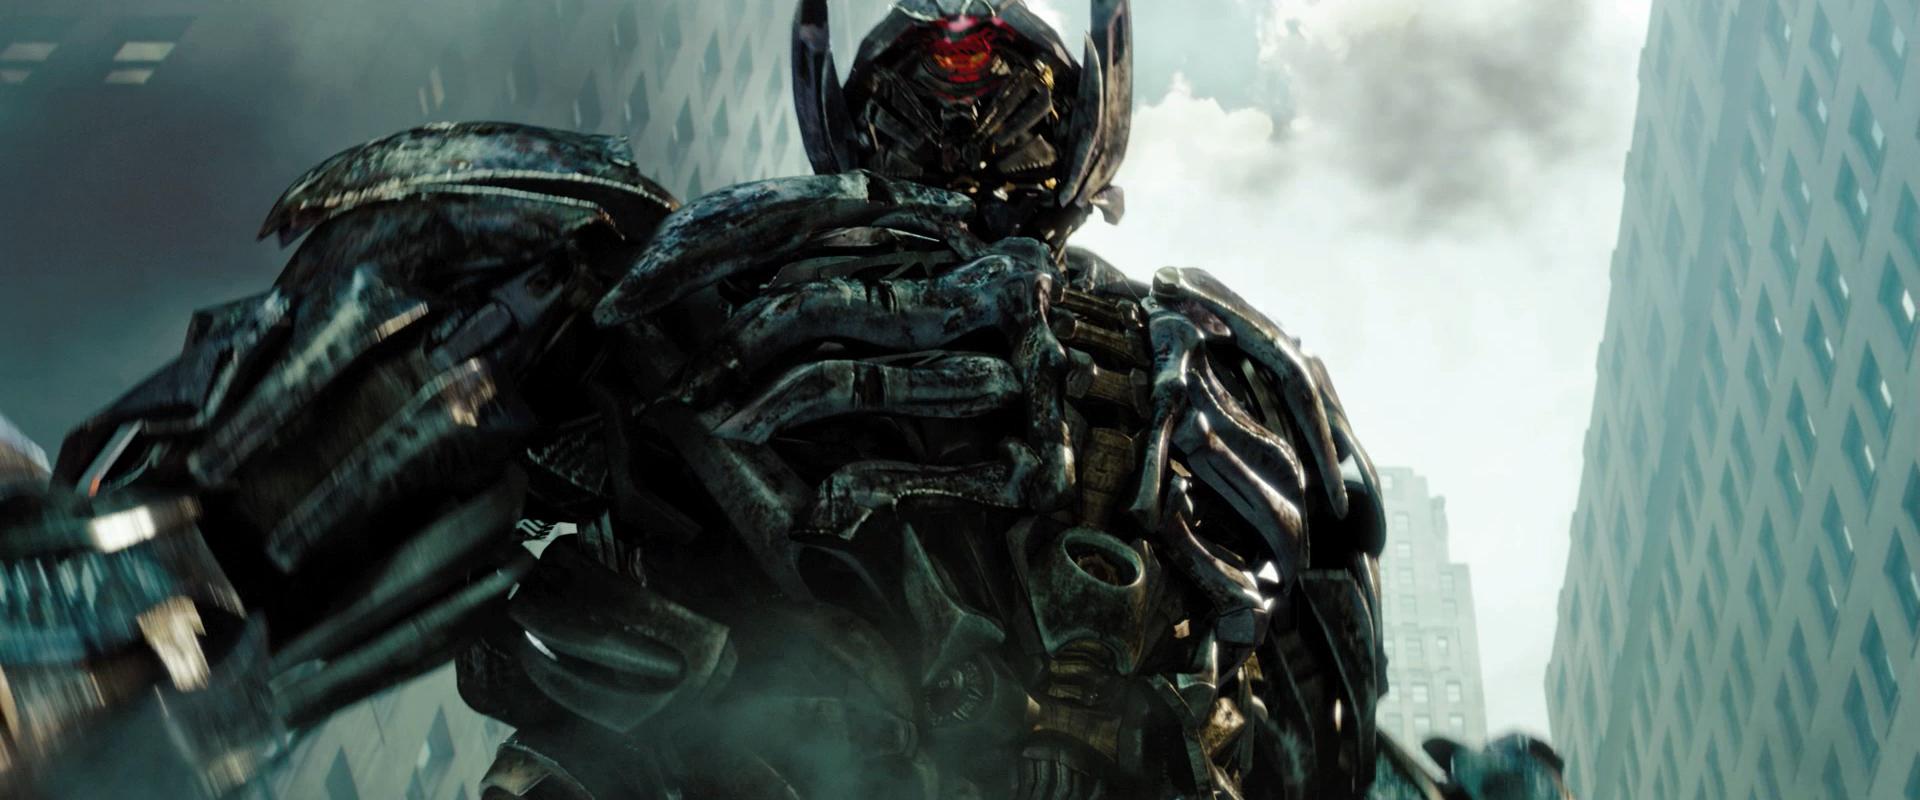 http://collider.com/wp-content/uploads/transformers-3-movie-image-shockwave-01.jpg